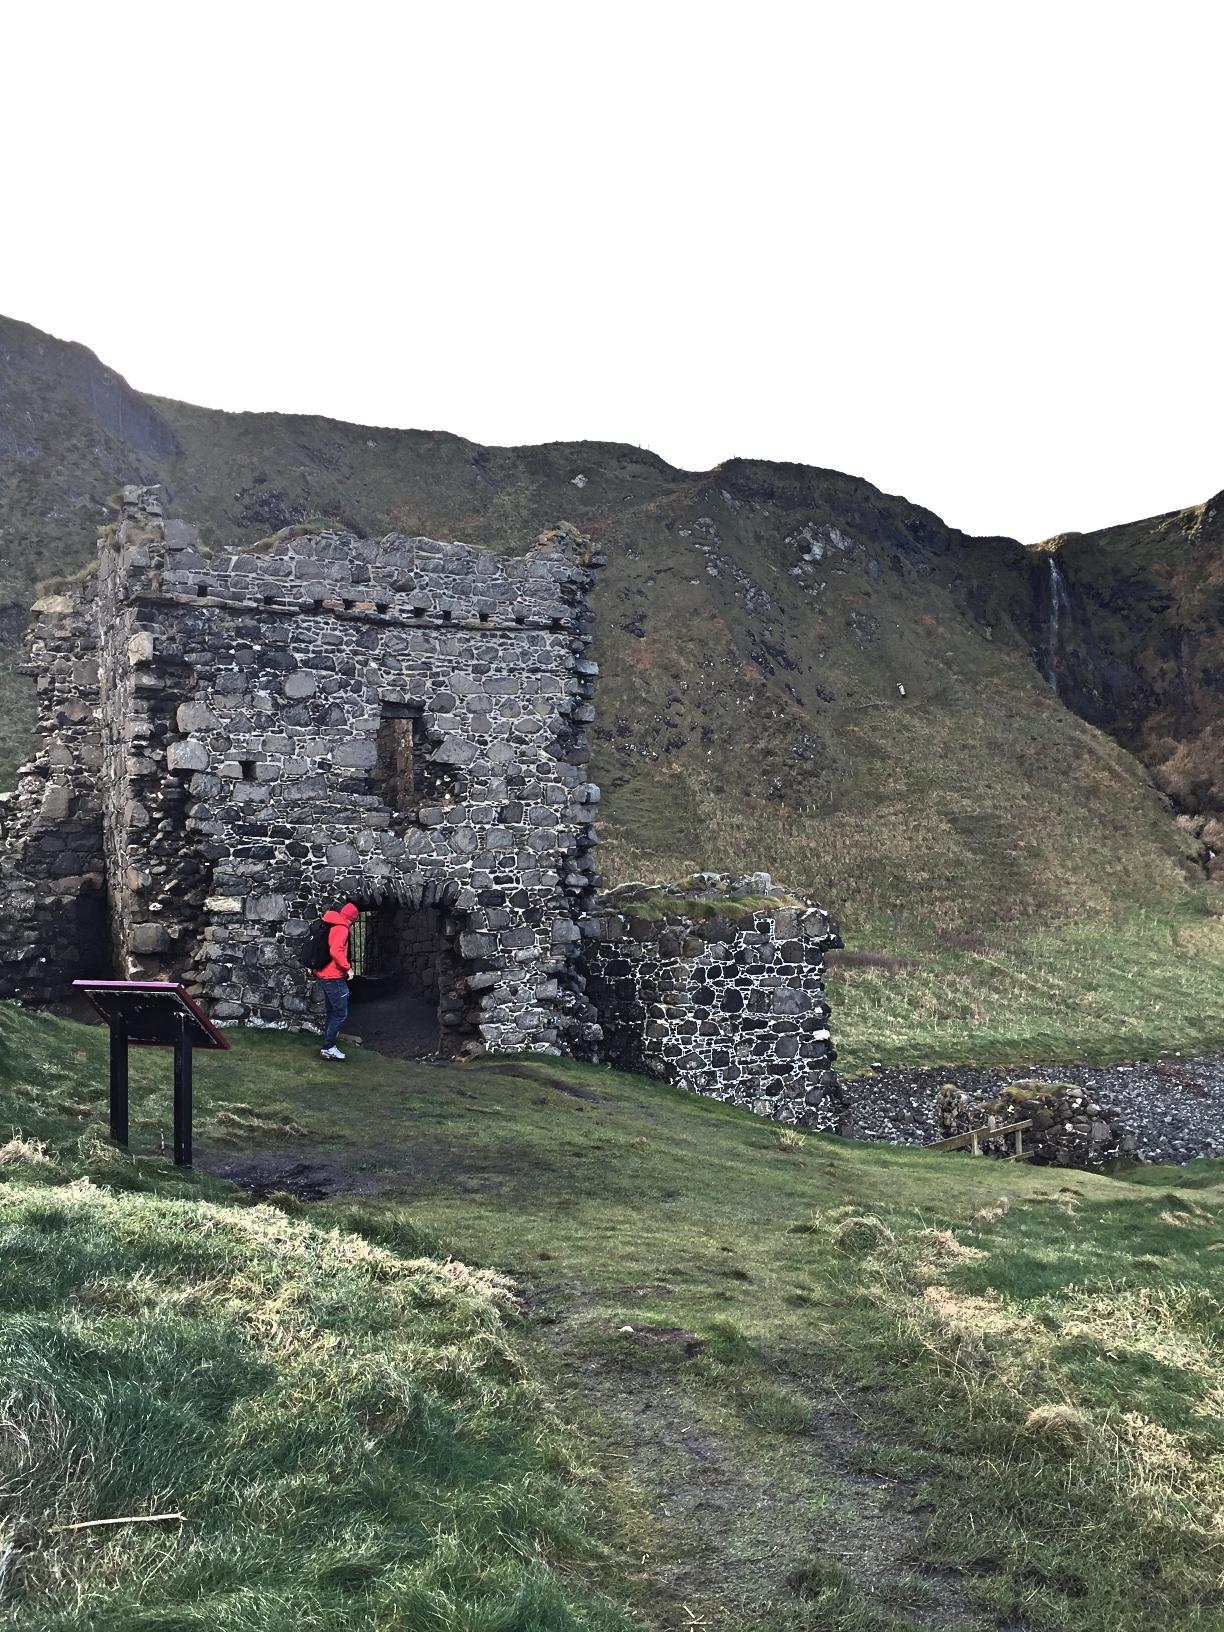 kinbane_head_castle_ni_explorer_northern_ireland (6).jpg